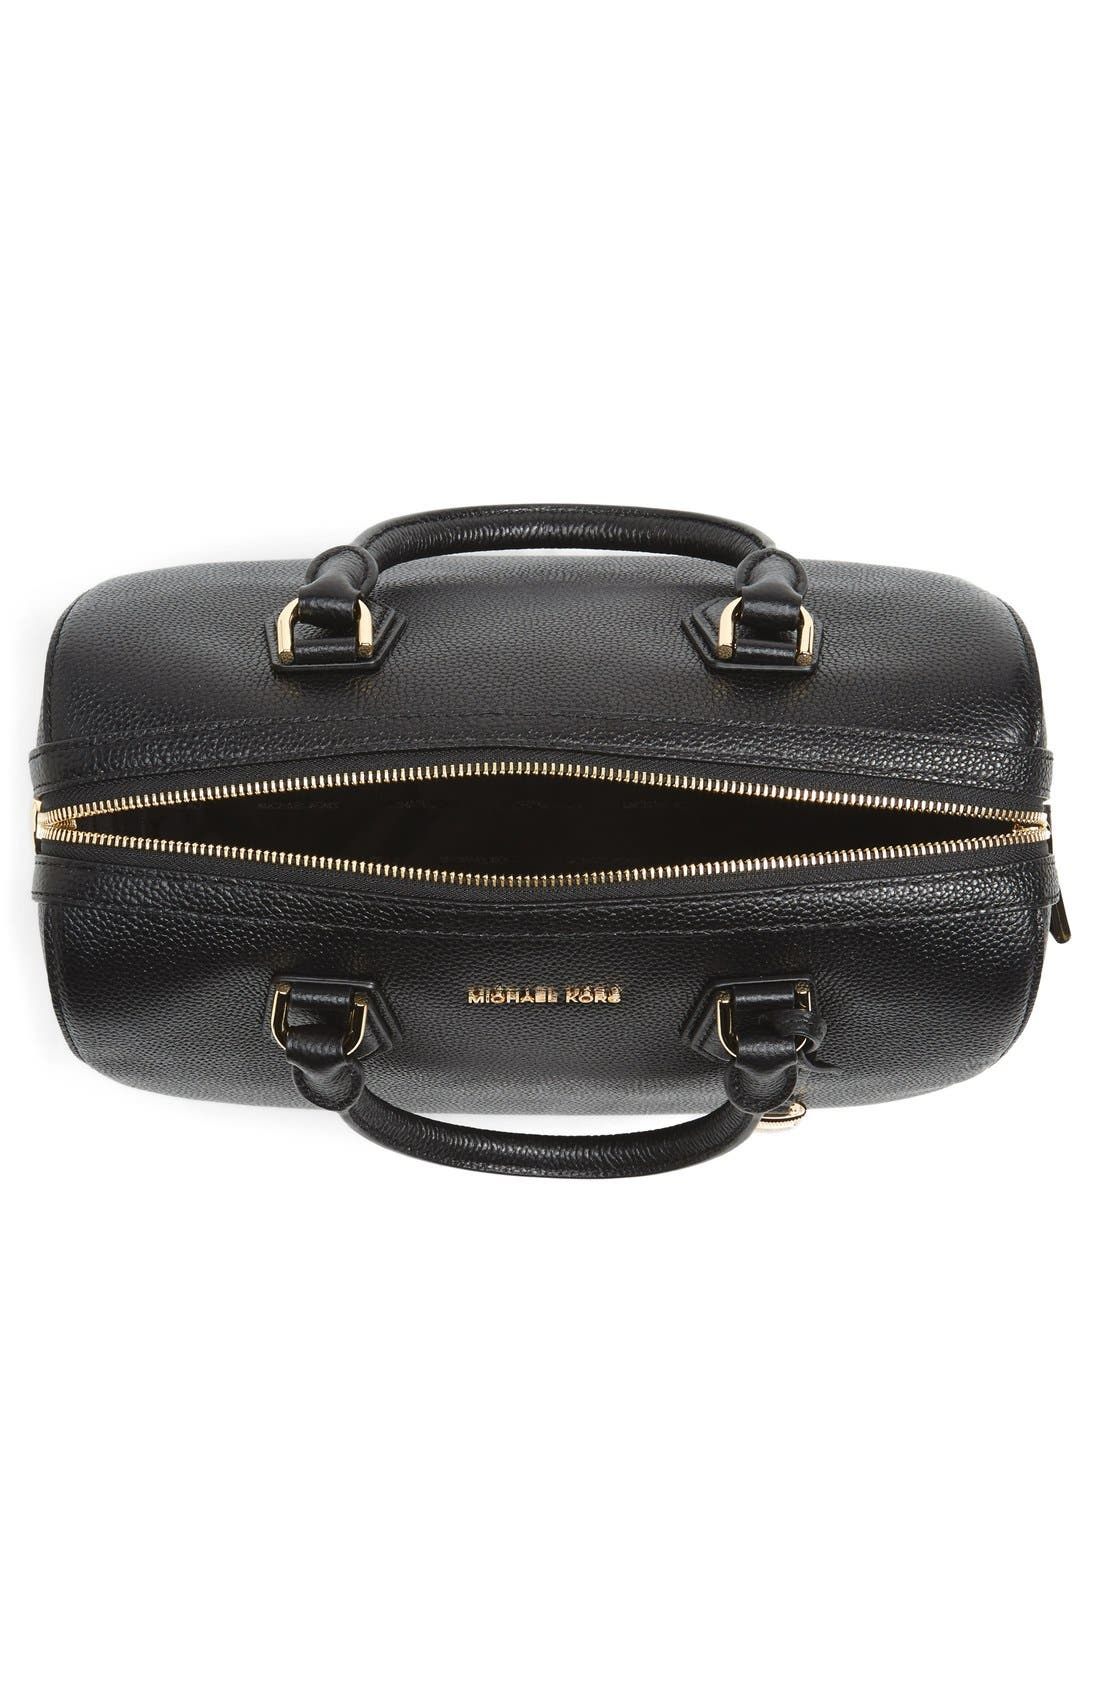 Medium Mercer Duffel Bag,                             Alternate thumbnail 4, color,                             Black/ Gold